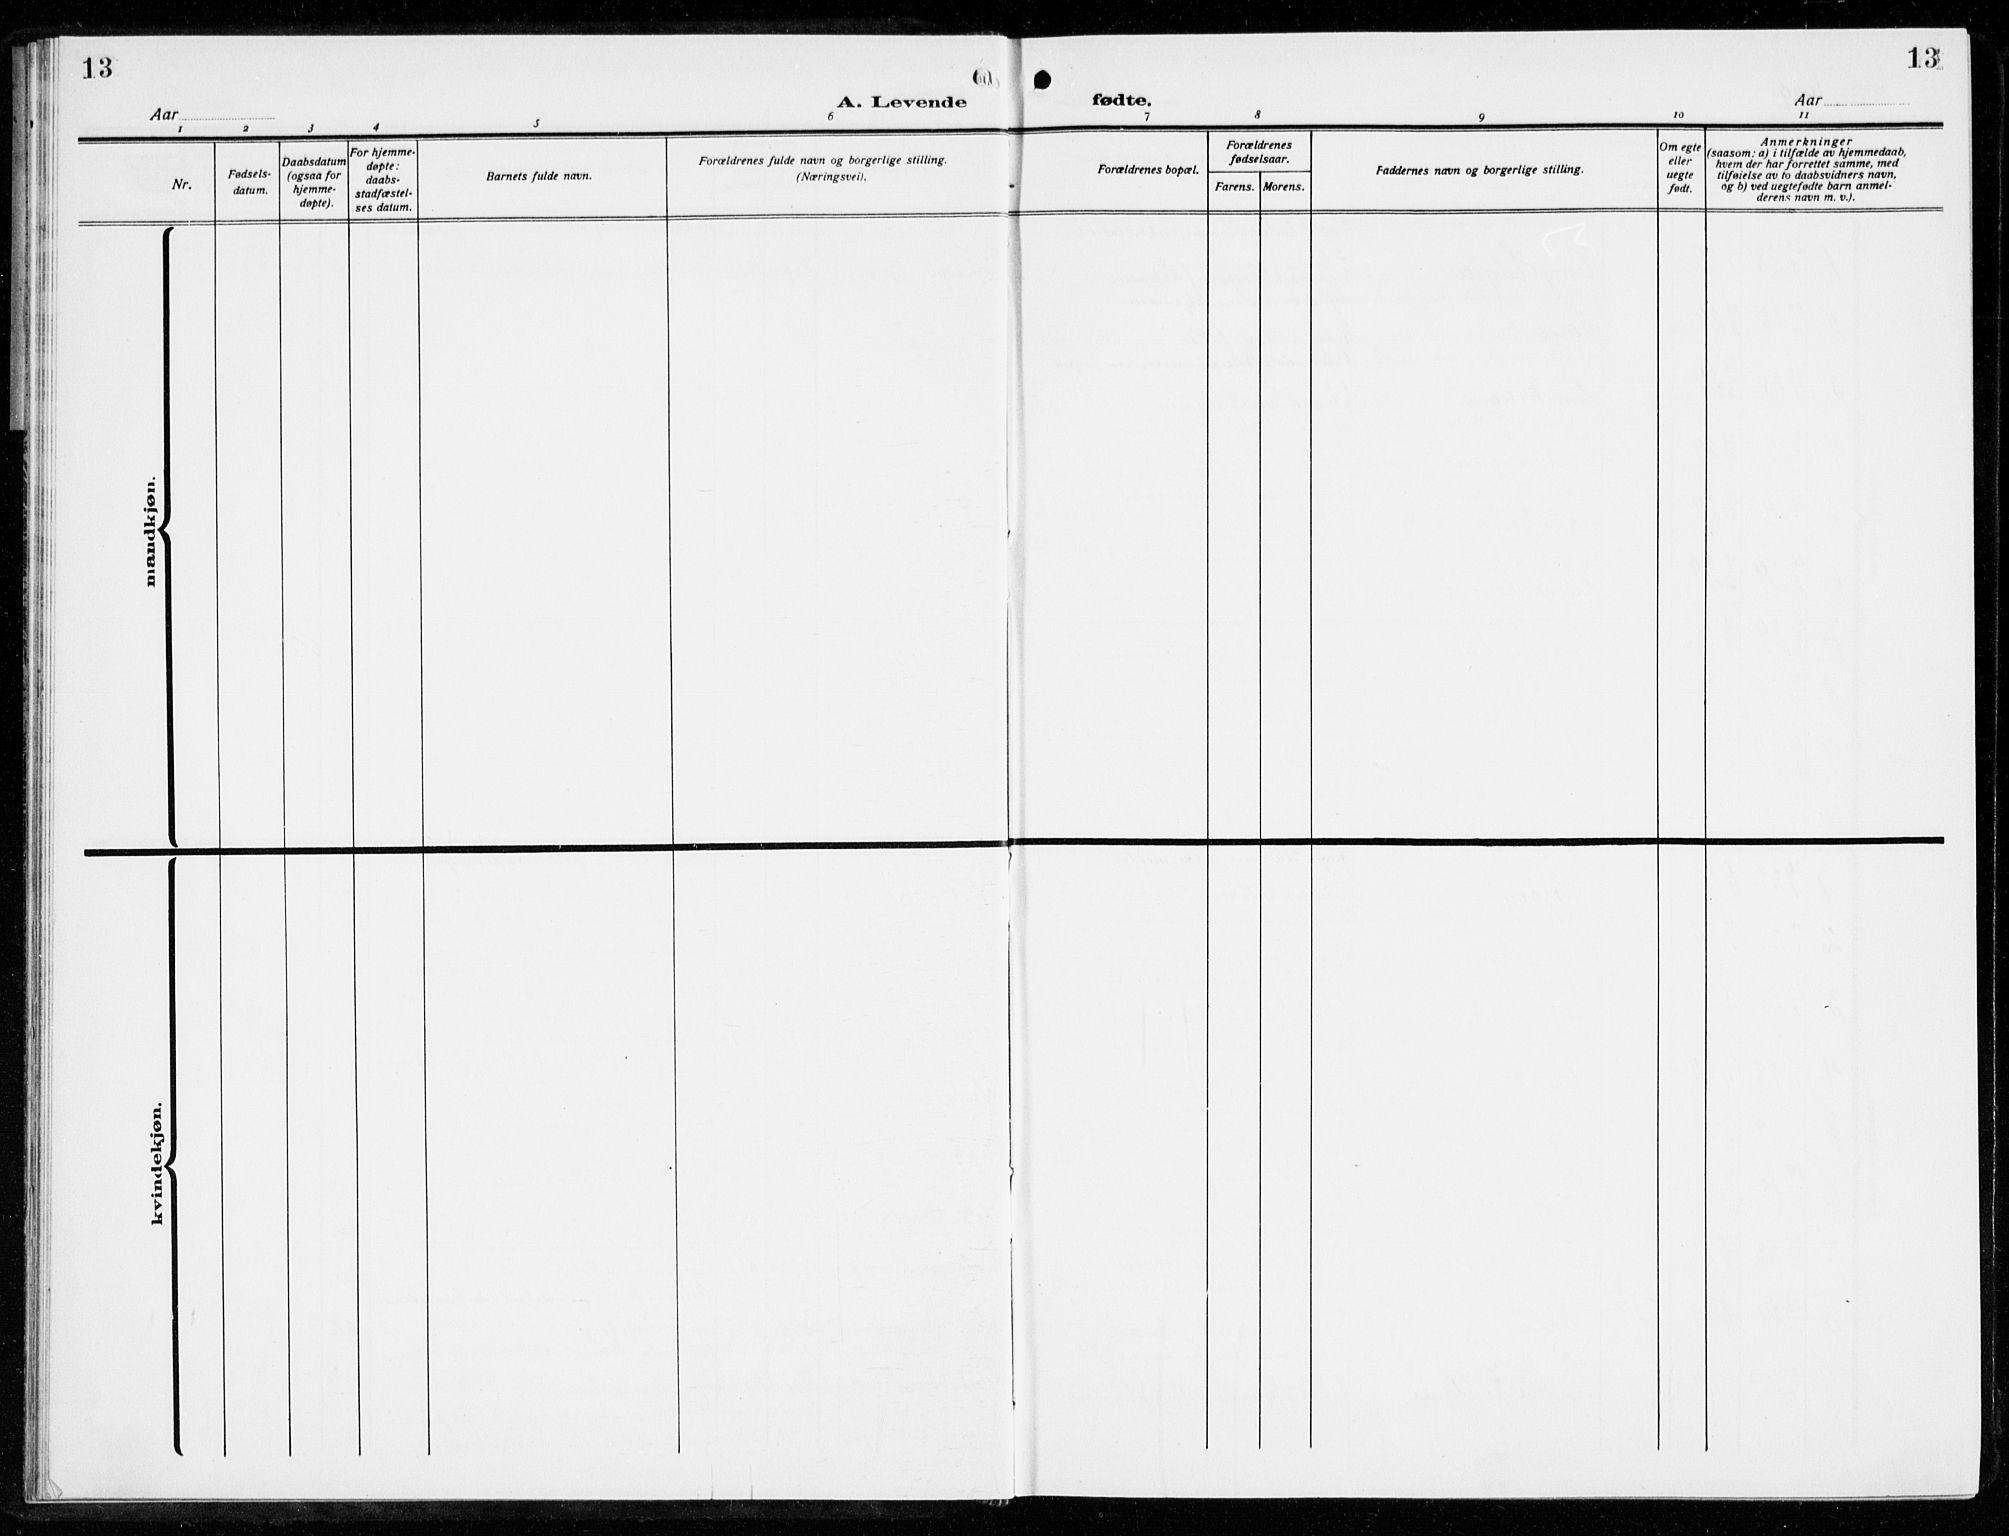 SAKO, Brevik kirkebøker, G/Ga/L0006: Klokkerbok nr. 6, 1922-1940, s. 13